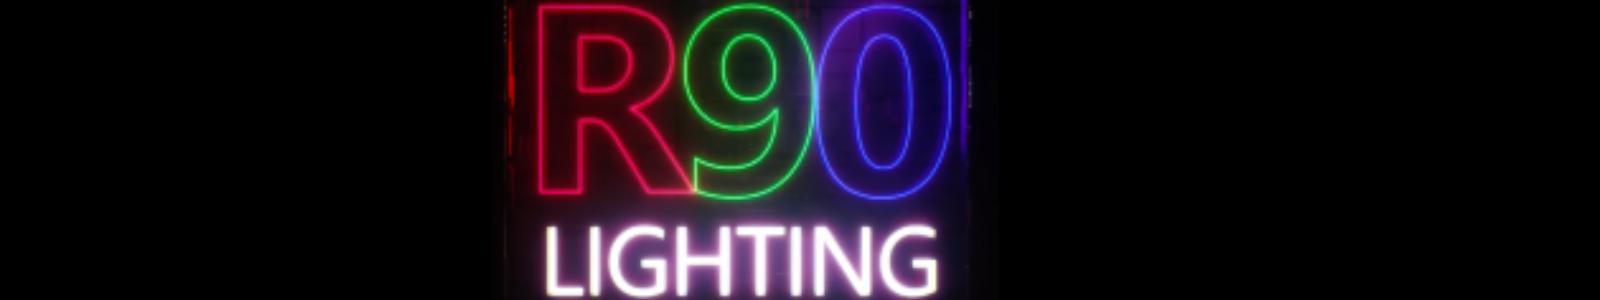 R90 Lighting - Business Sponsor of The DJ Sessions